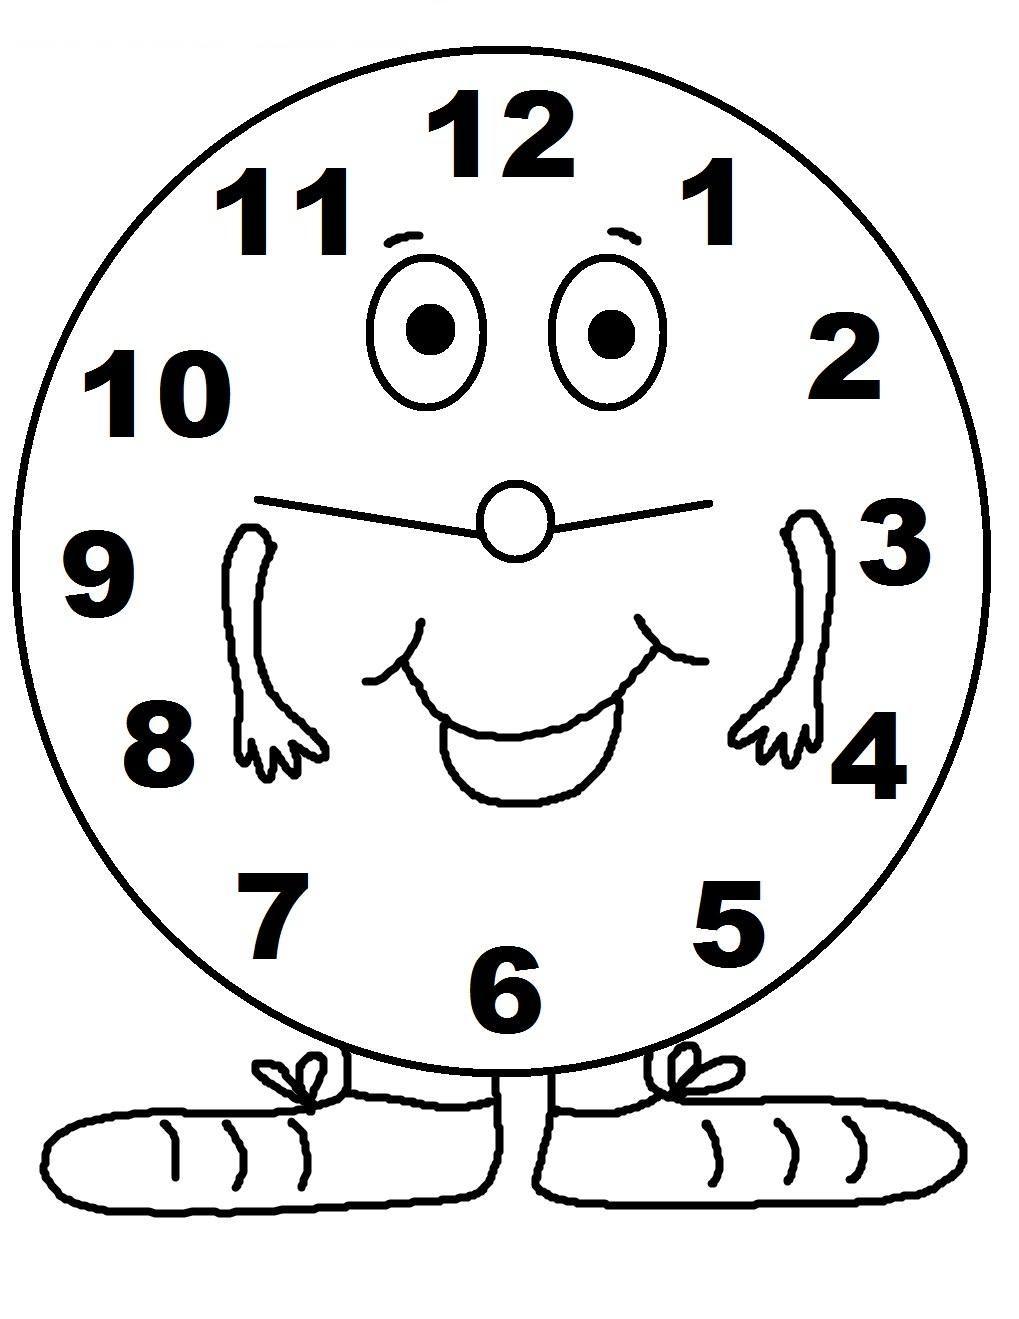 51 Coloring Page Clock Coloring Pages Coloring Pages For Kids Clock Printable